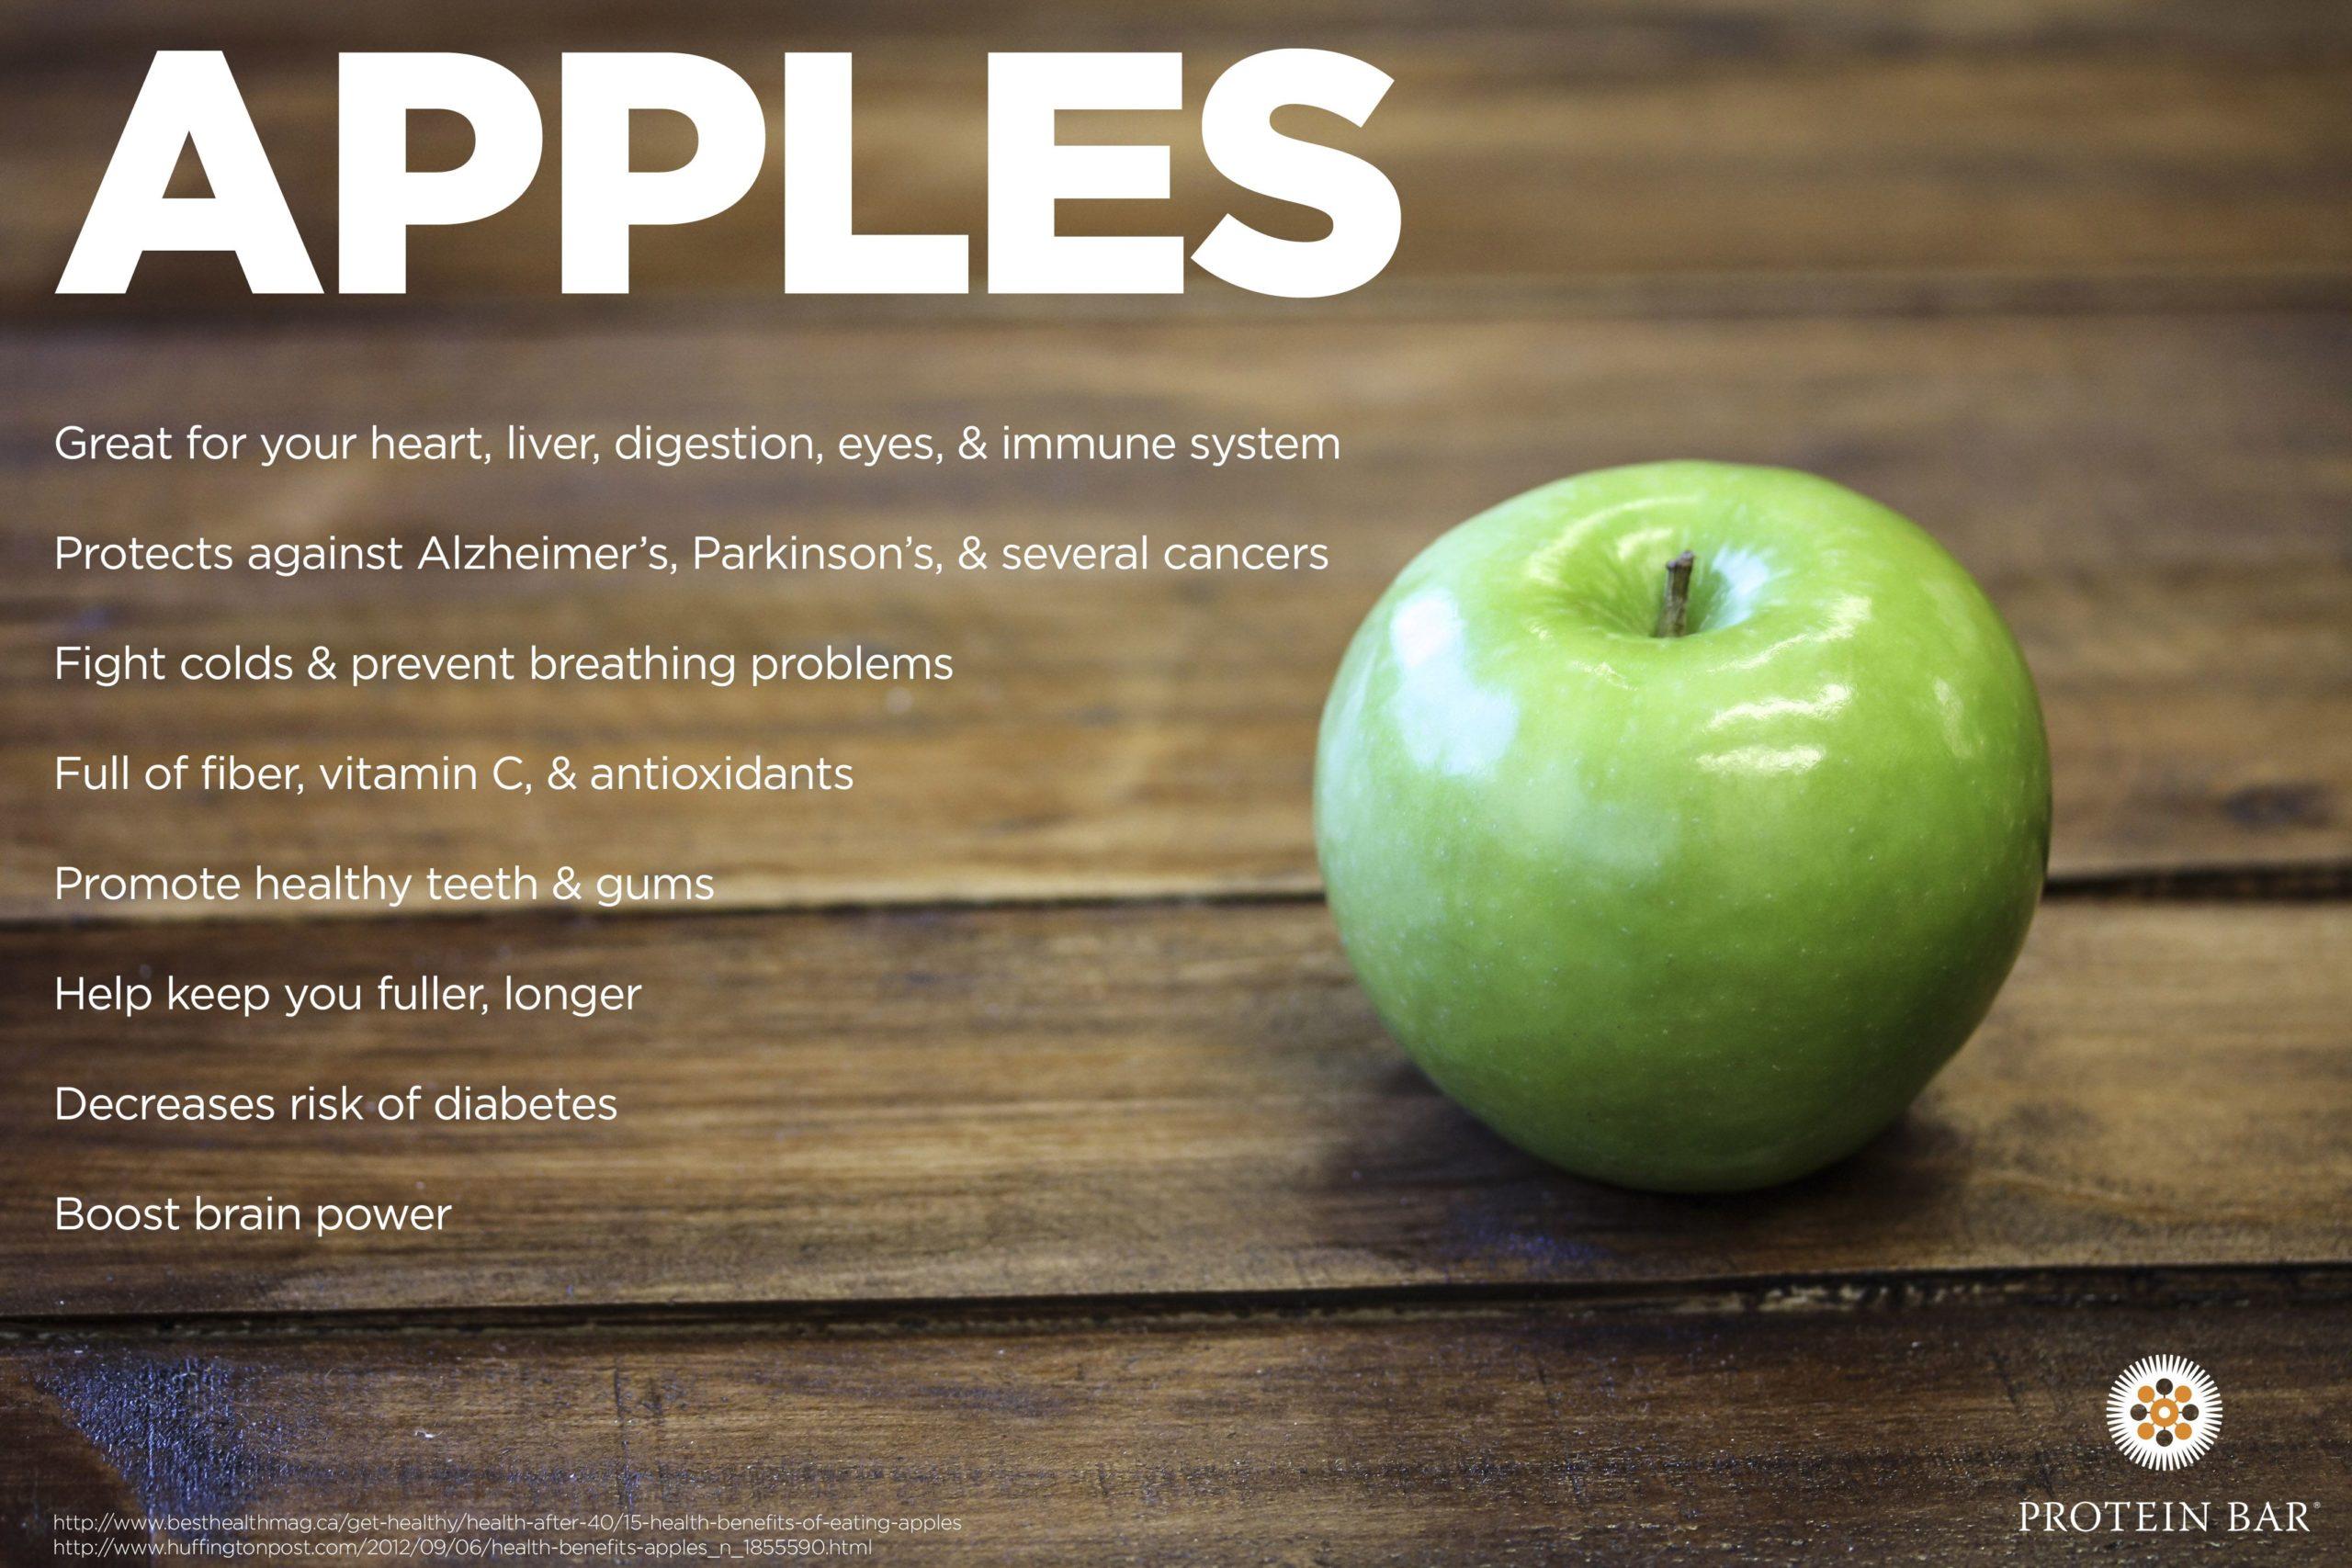 apples good for teeth apple help get rid of bad breath